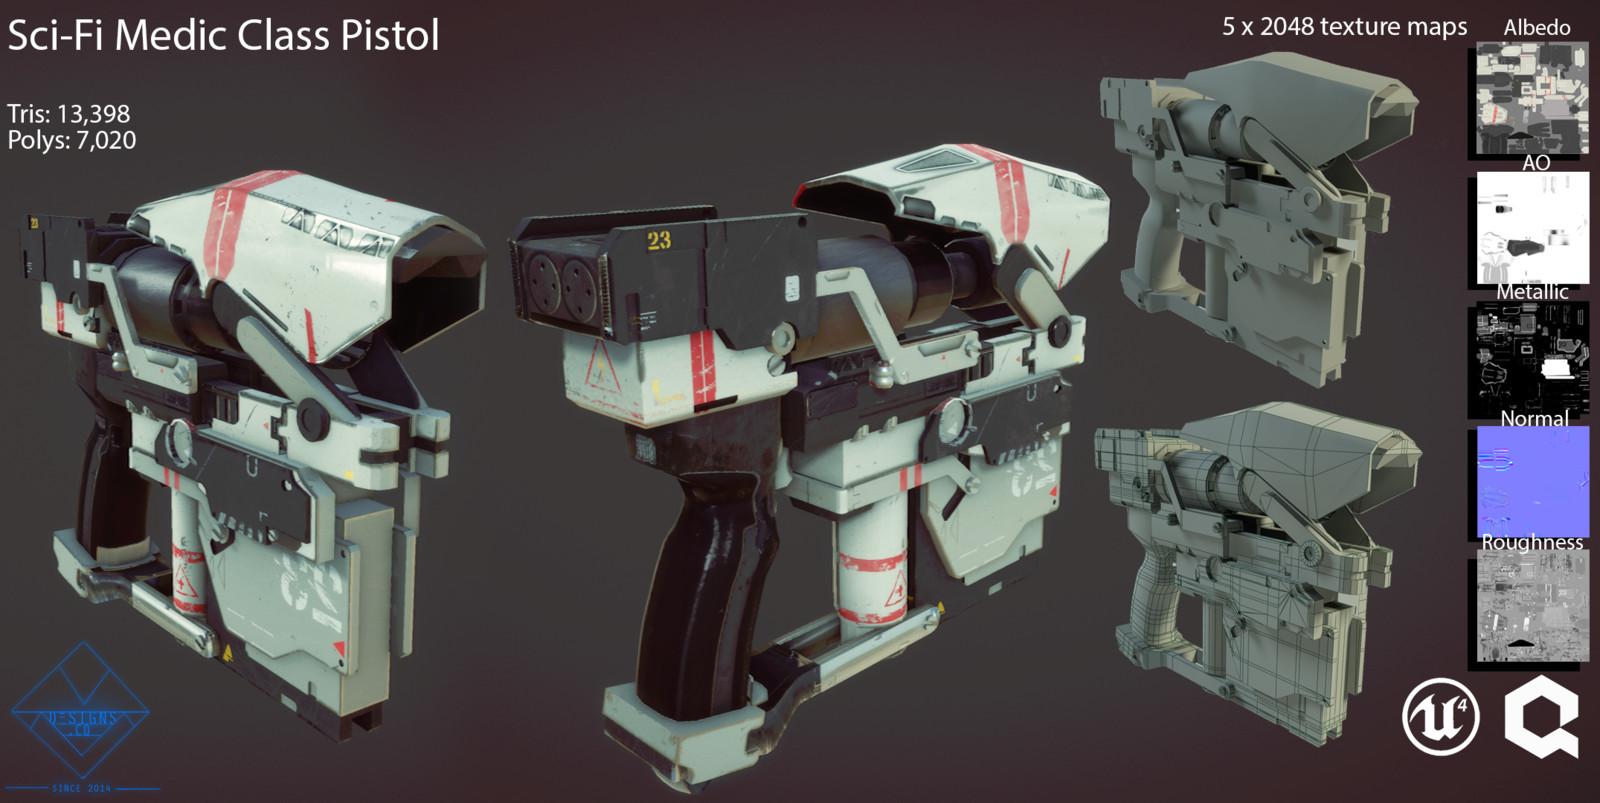 Sci-Fi Medic Gun